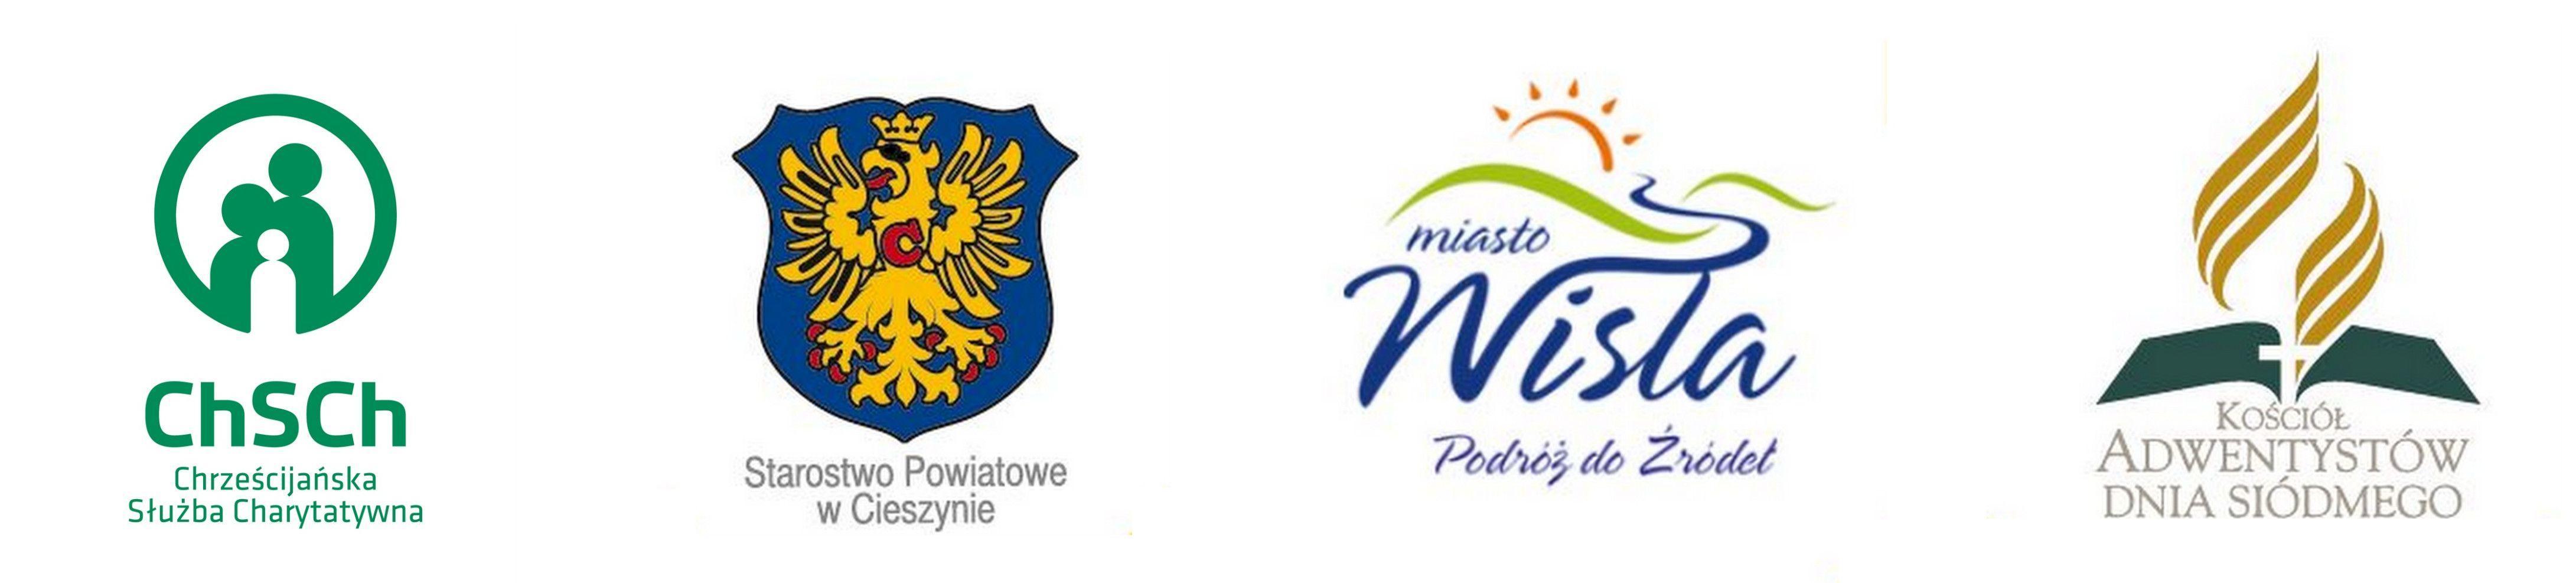 https://www.bliskoserca.pl/media/chsch/Organizator_i_sponsorzy.jpg